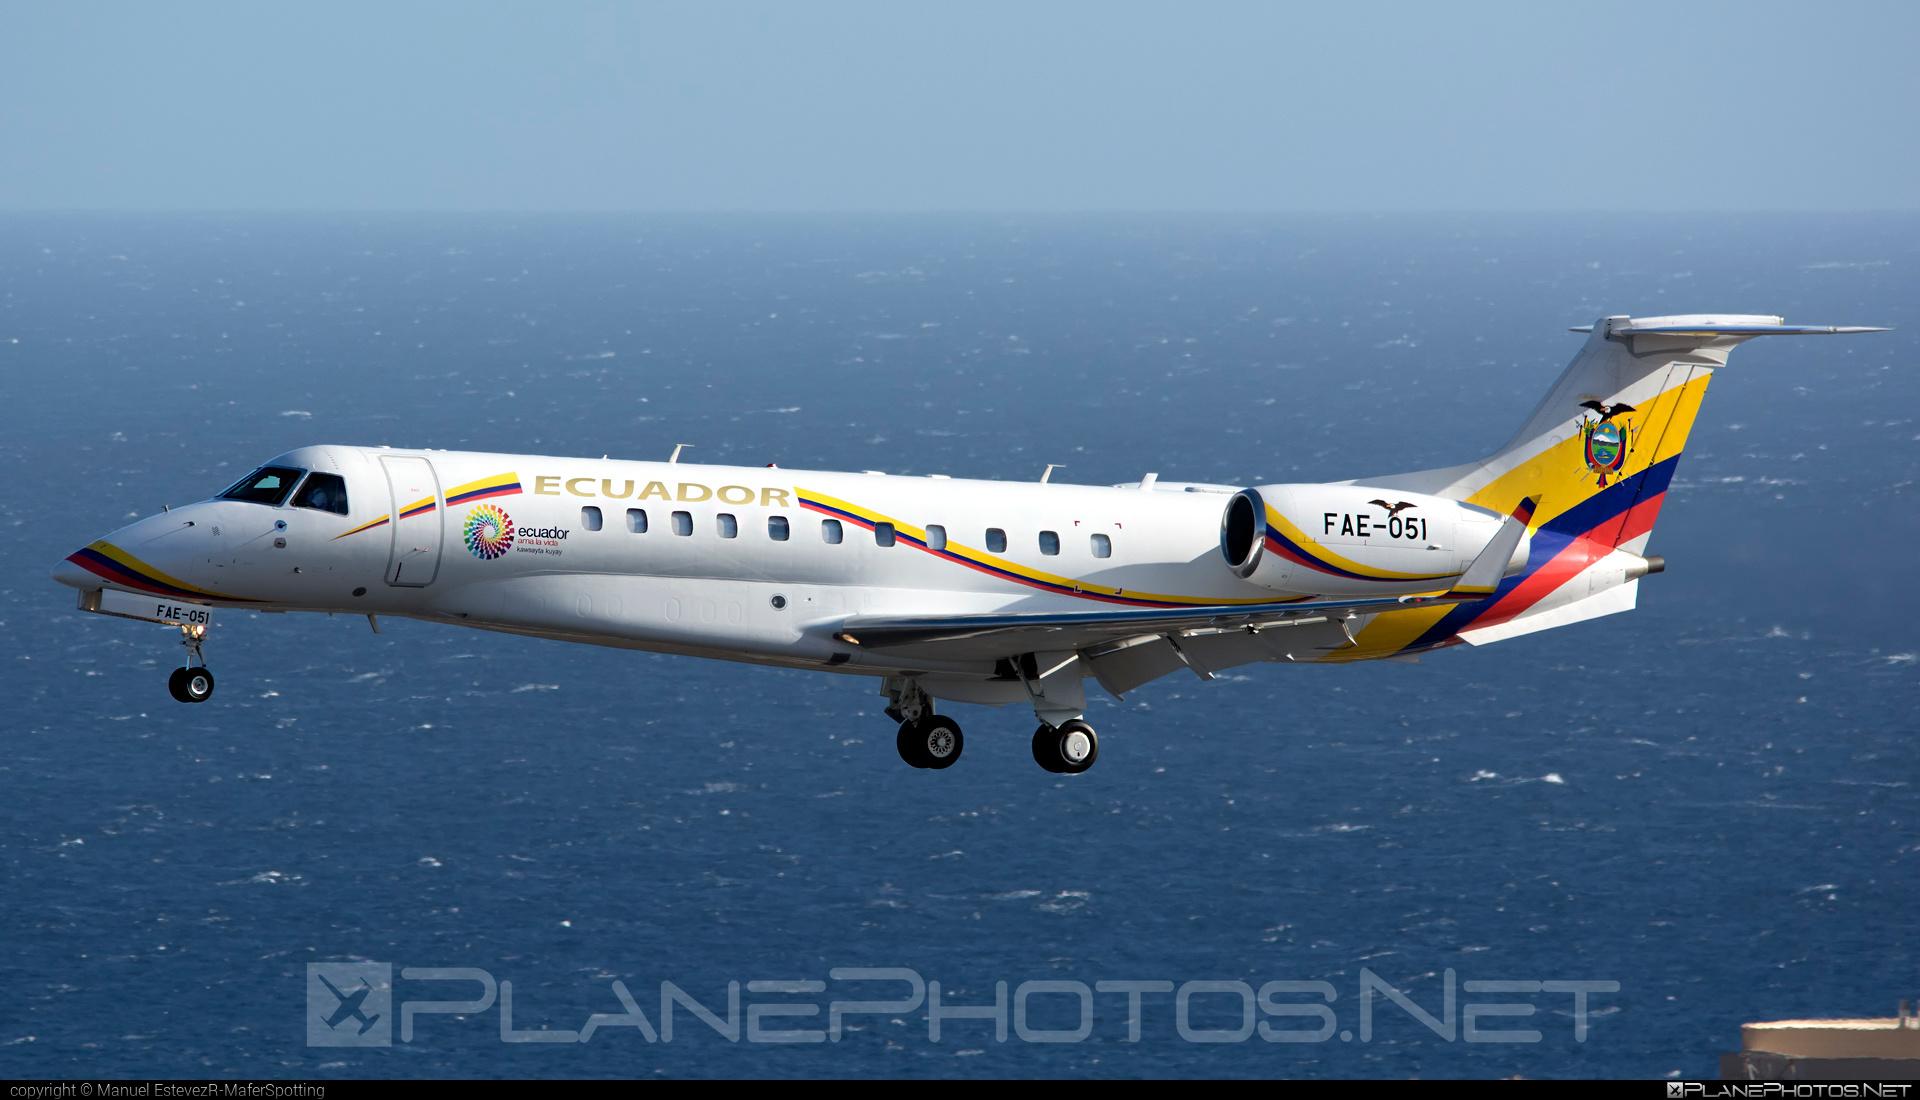 Embraer ERJ-135BJ Legacy 600 - FAE-051 operated by Fuerza Aérea Ecuadoriana (Ecuadorian Air Force) #embraer #embraer135 #embraerlegacy #erj135 #erj135bj #legacy600